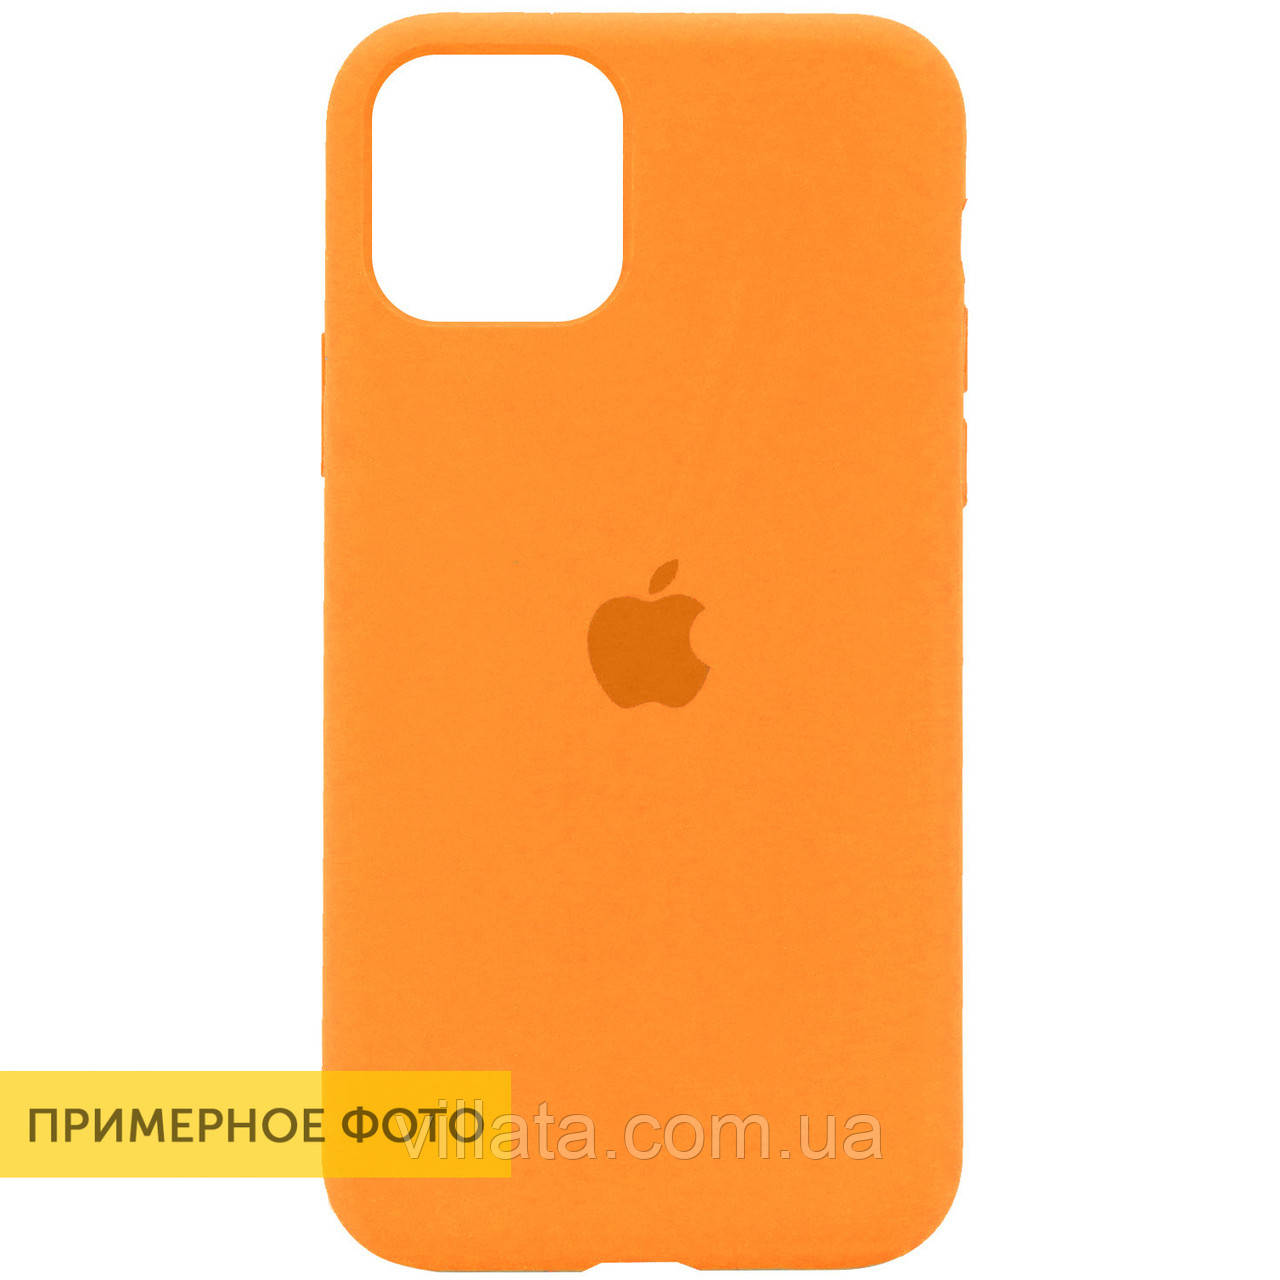 "Чехол Silicone Case Full Protective (AA) для Apple iPhone 7 / 8 / SE (2020) (4.7"") Apple iPhone 7 / 8 (4.7""), Для телефона, Оранжевый / Papaya"